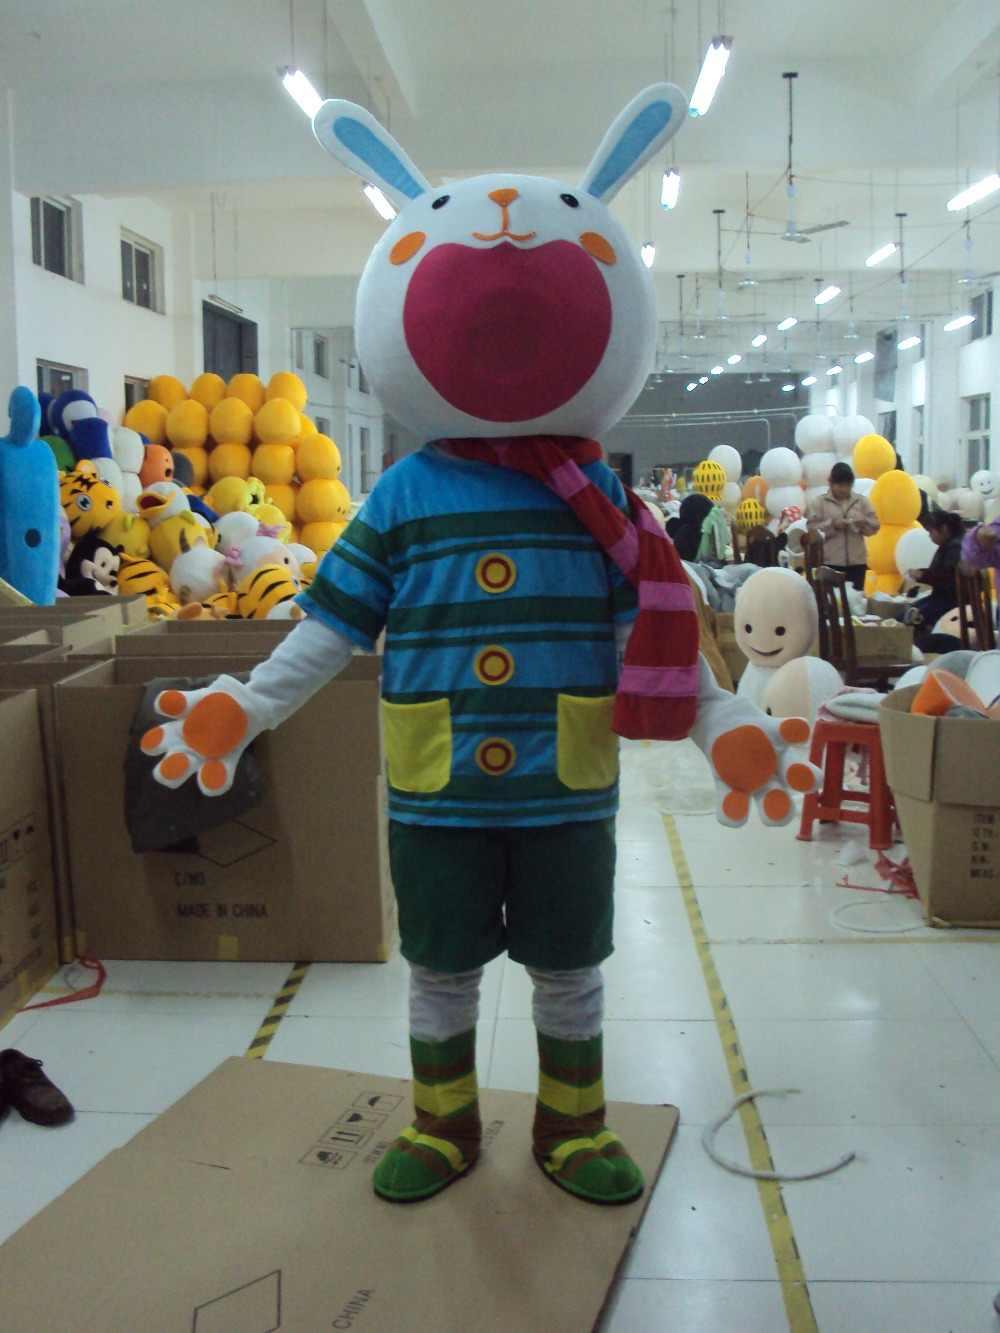 Hot Sale Profesional Kostum Maskot Dewasa Ukuran Fancy Dress Mulut Besar Easter Bunny Bug Kelinci Kostum Maskot EMS Kapal Gratis